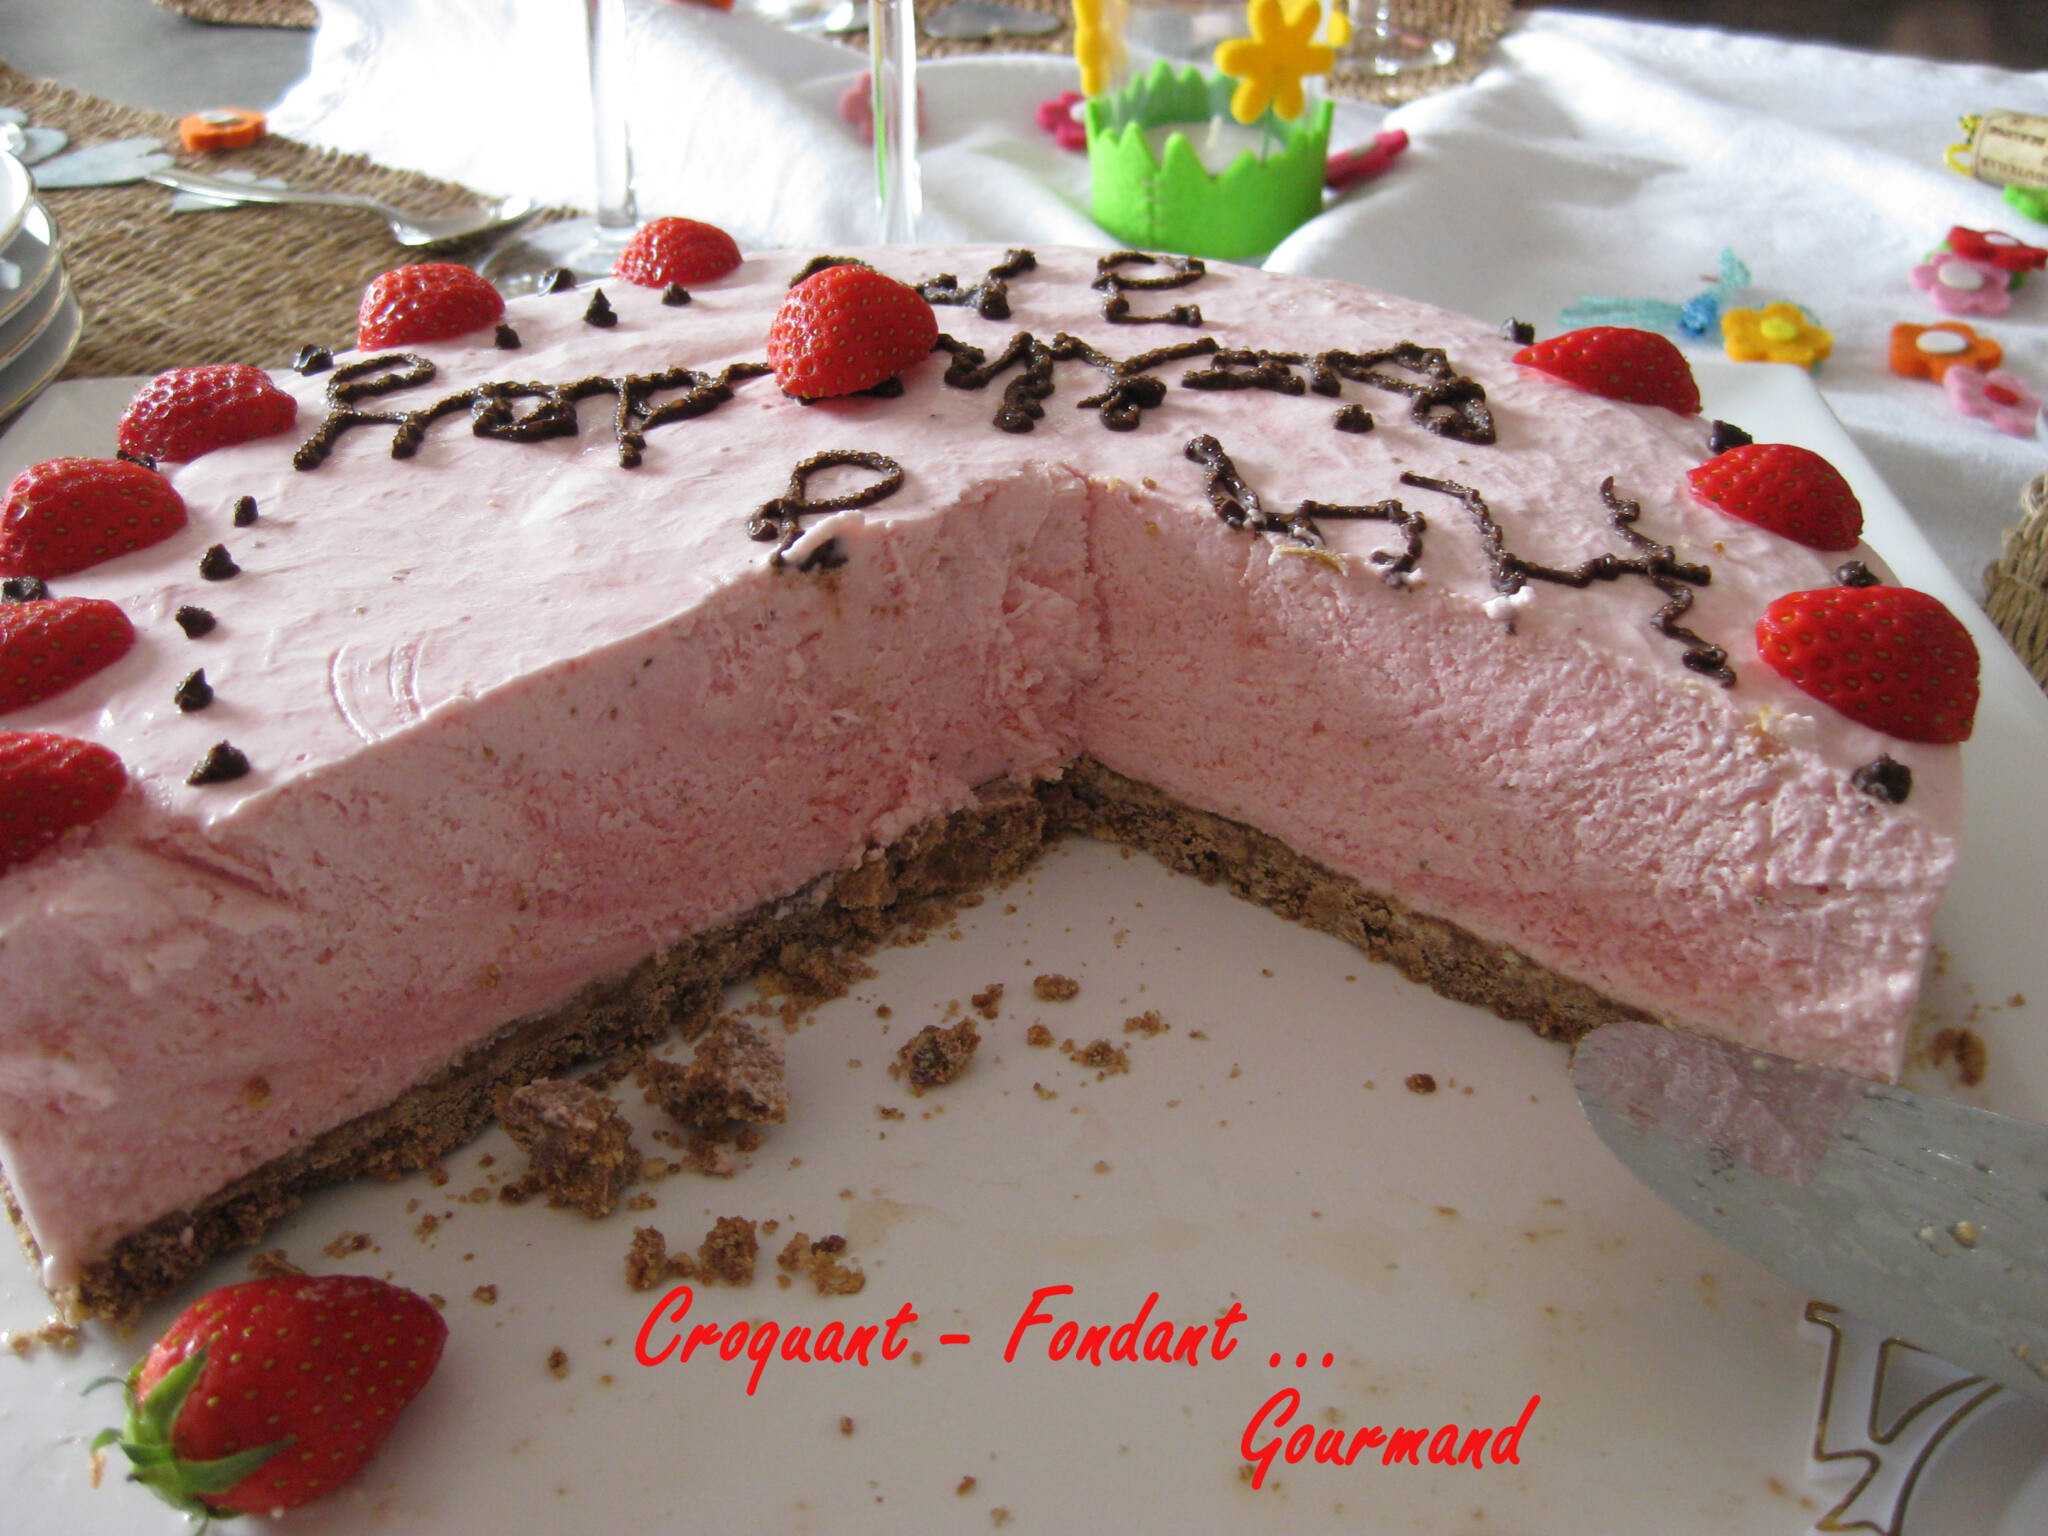 Cheesecake fraise - Croquant Fondant Gourmand